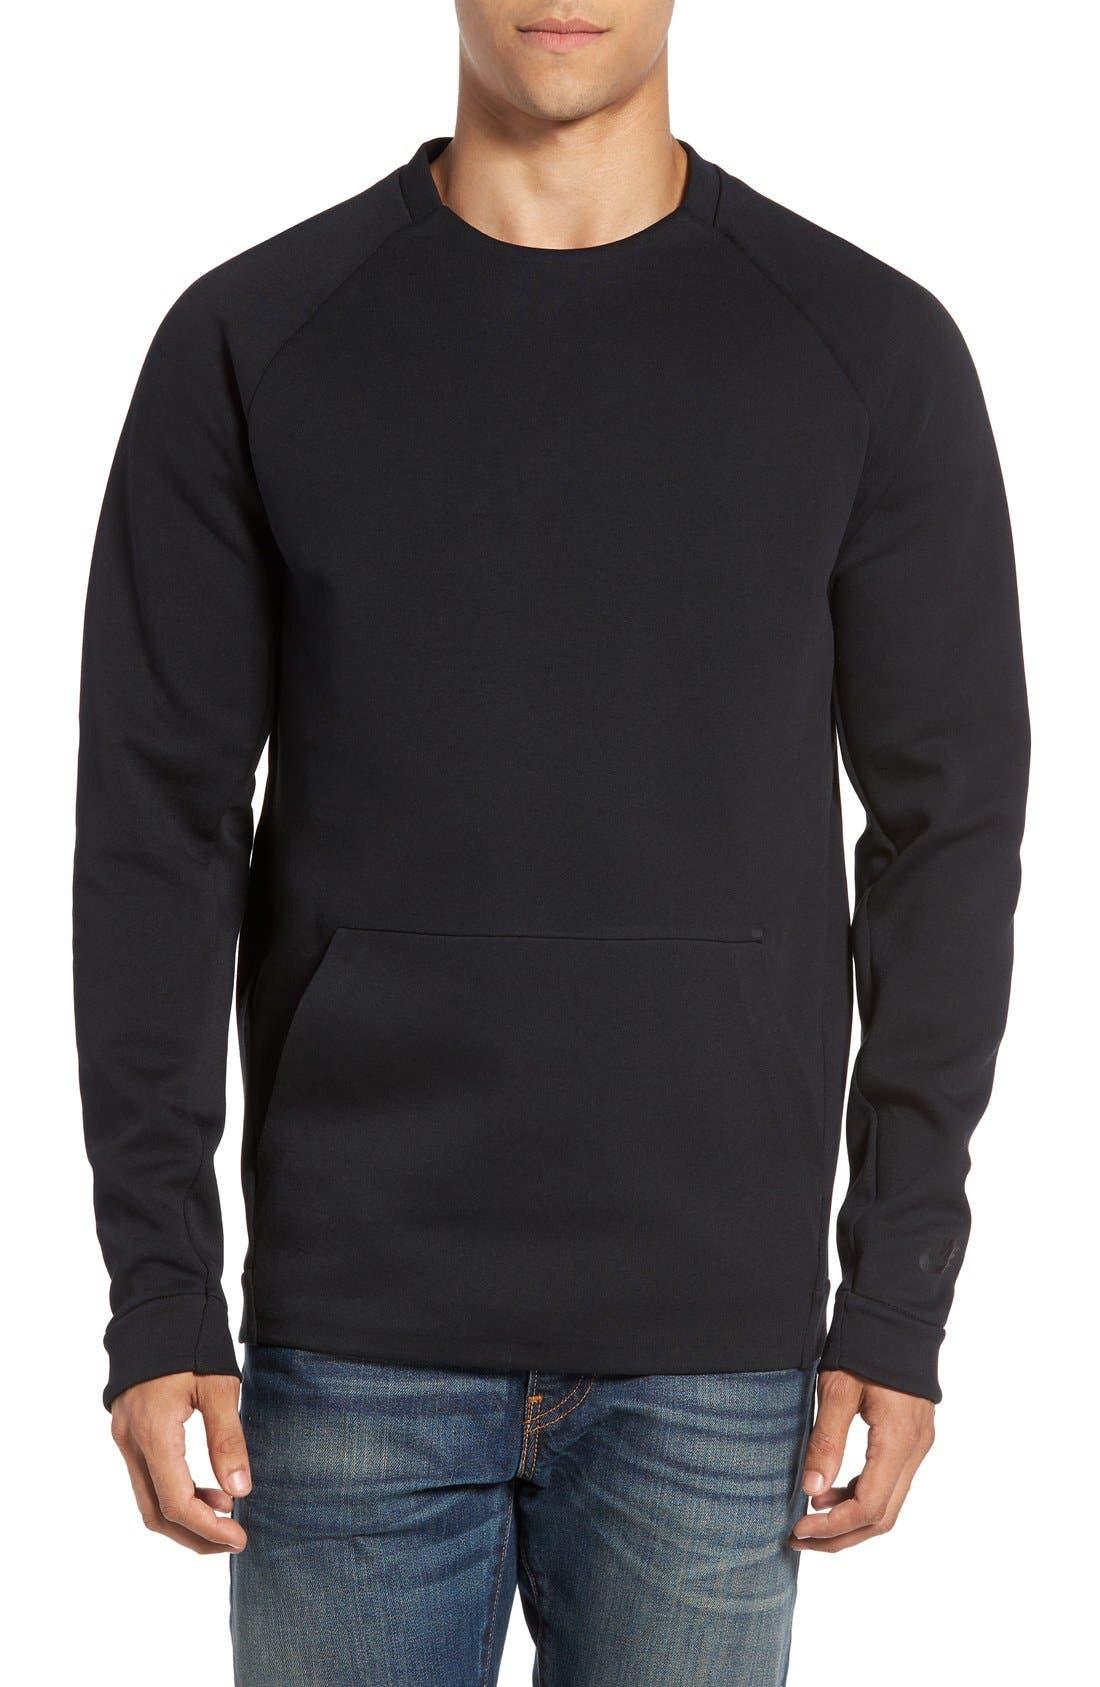 Alternate Image 1 Selected - Nike 'NSW Tech Fleece' Raglan Pullover